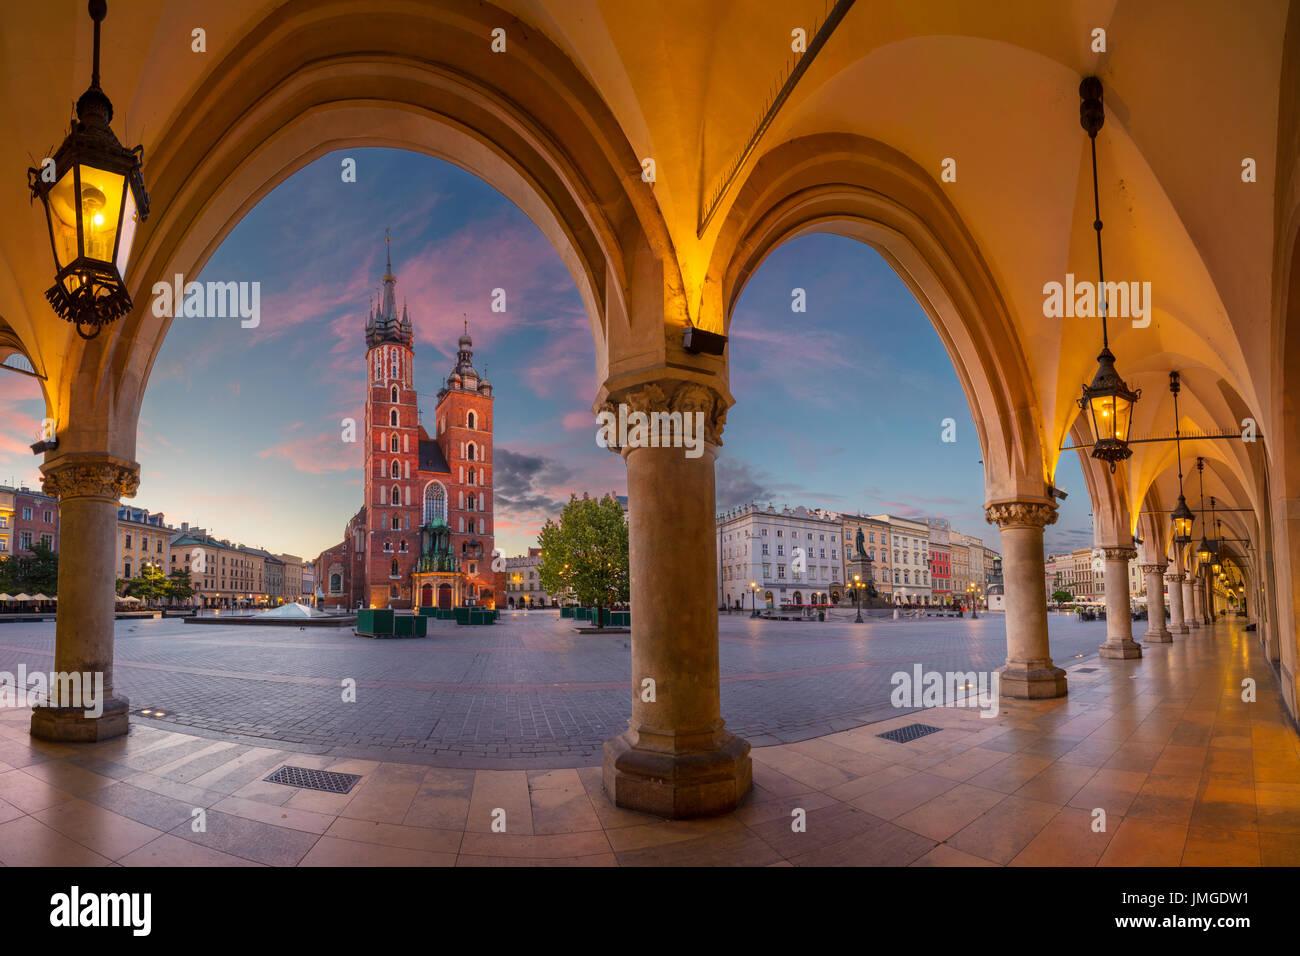 Krakow. Image of Krakow Market square, Poland during sunrise. - Stock Image